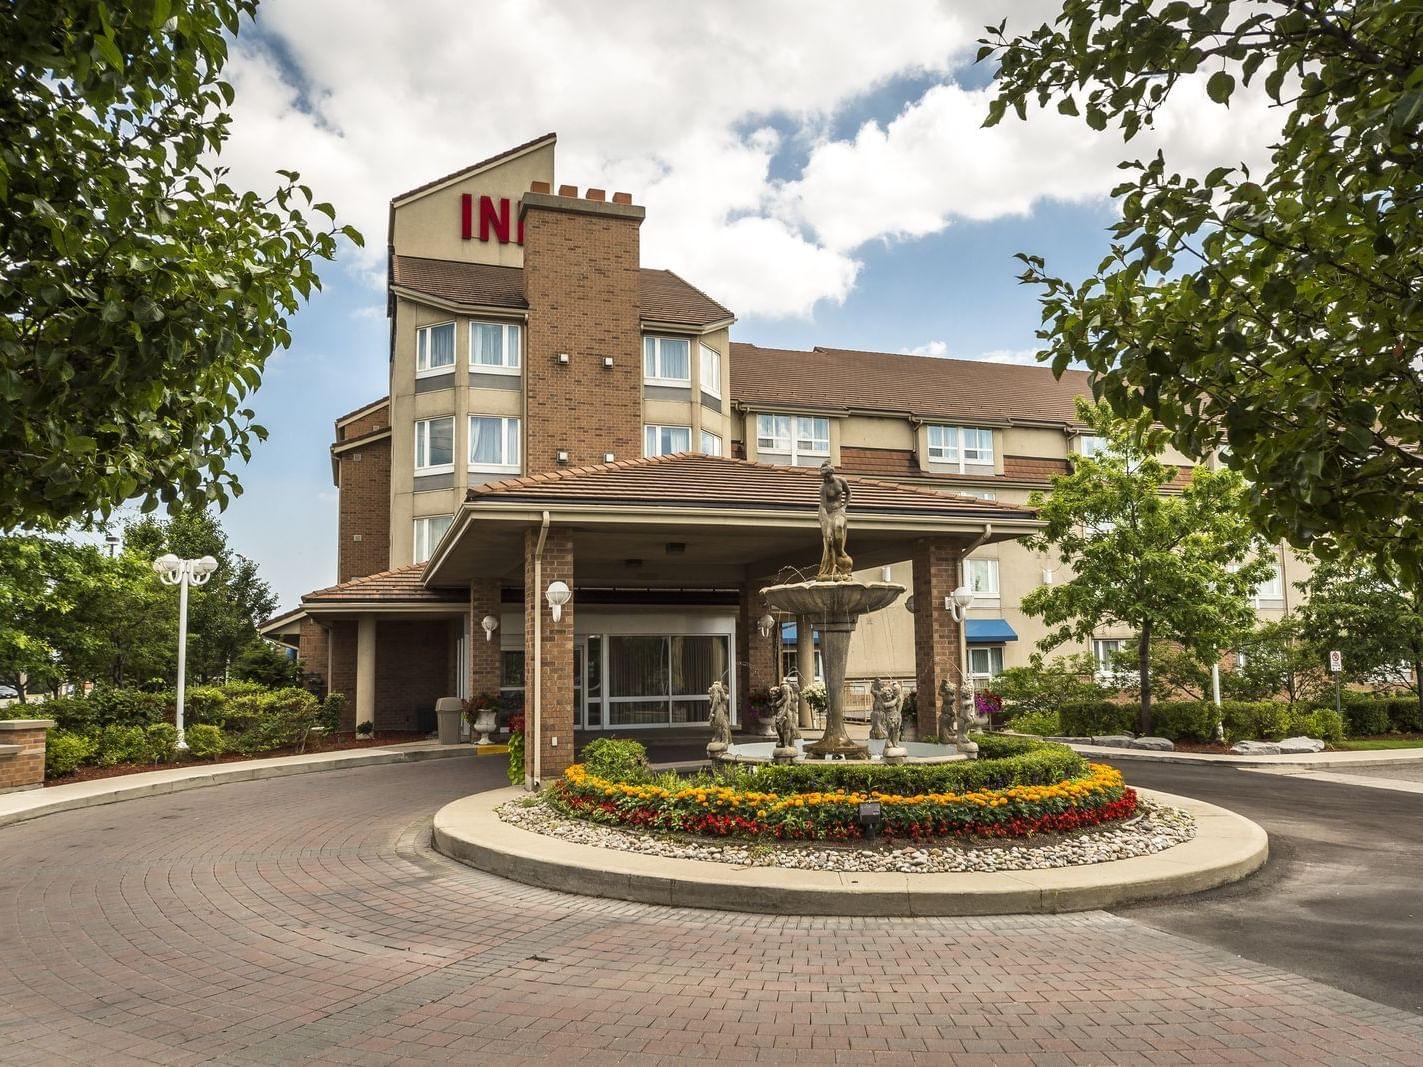 Exterior View - Monte Carlo Inns - Brand Site